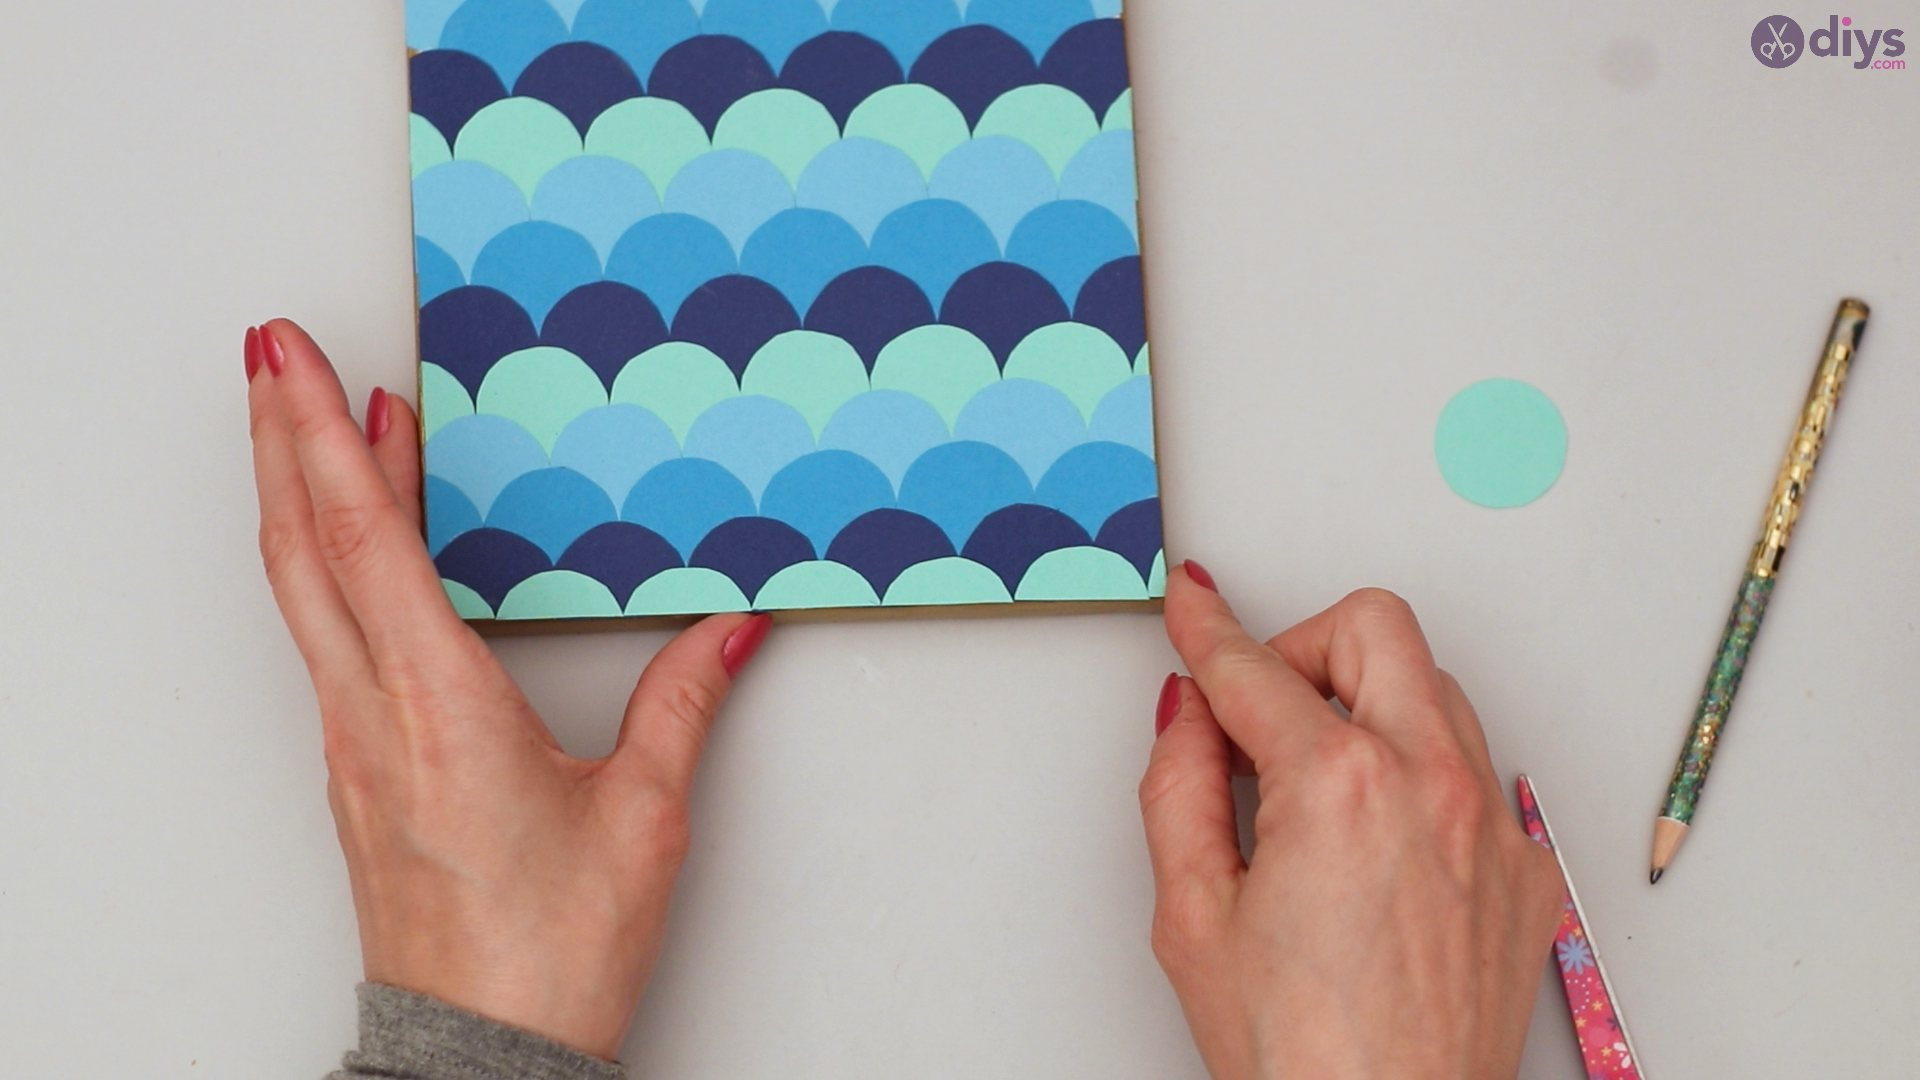 Diy fish scale wall decor (38)